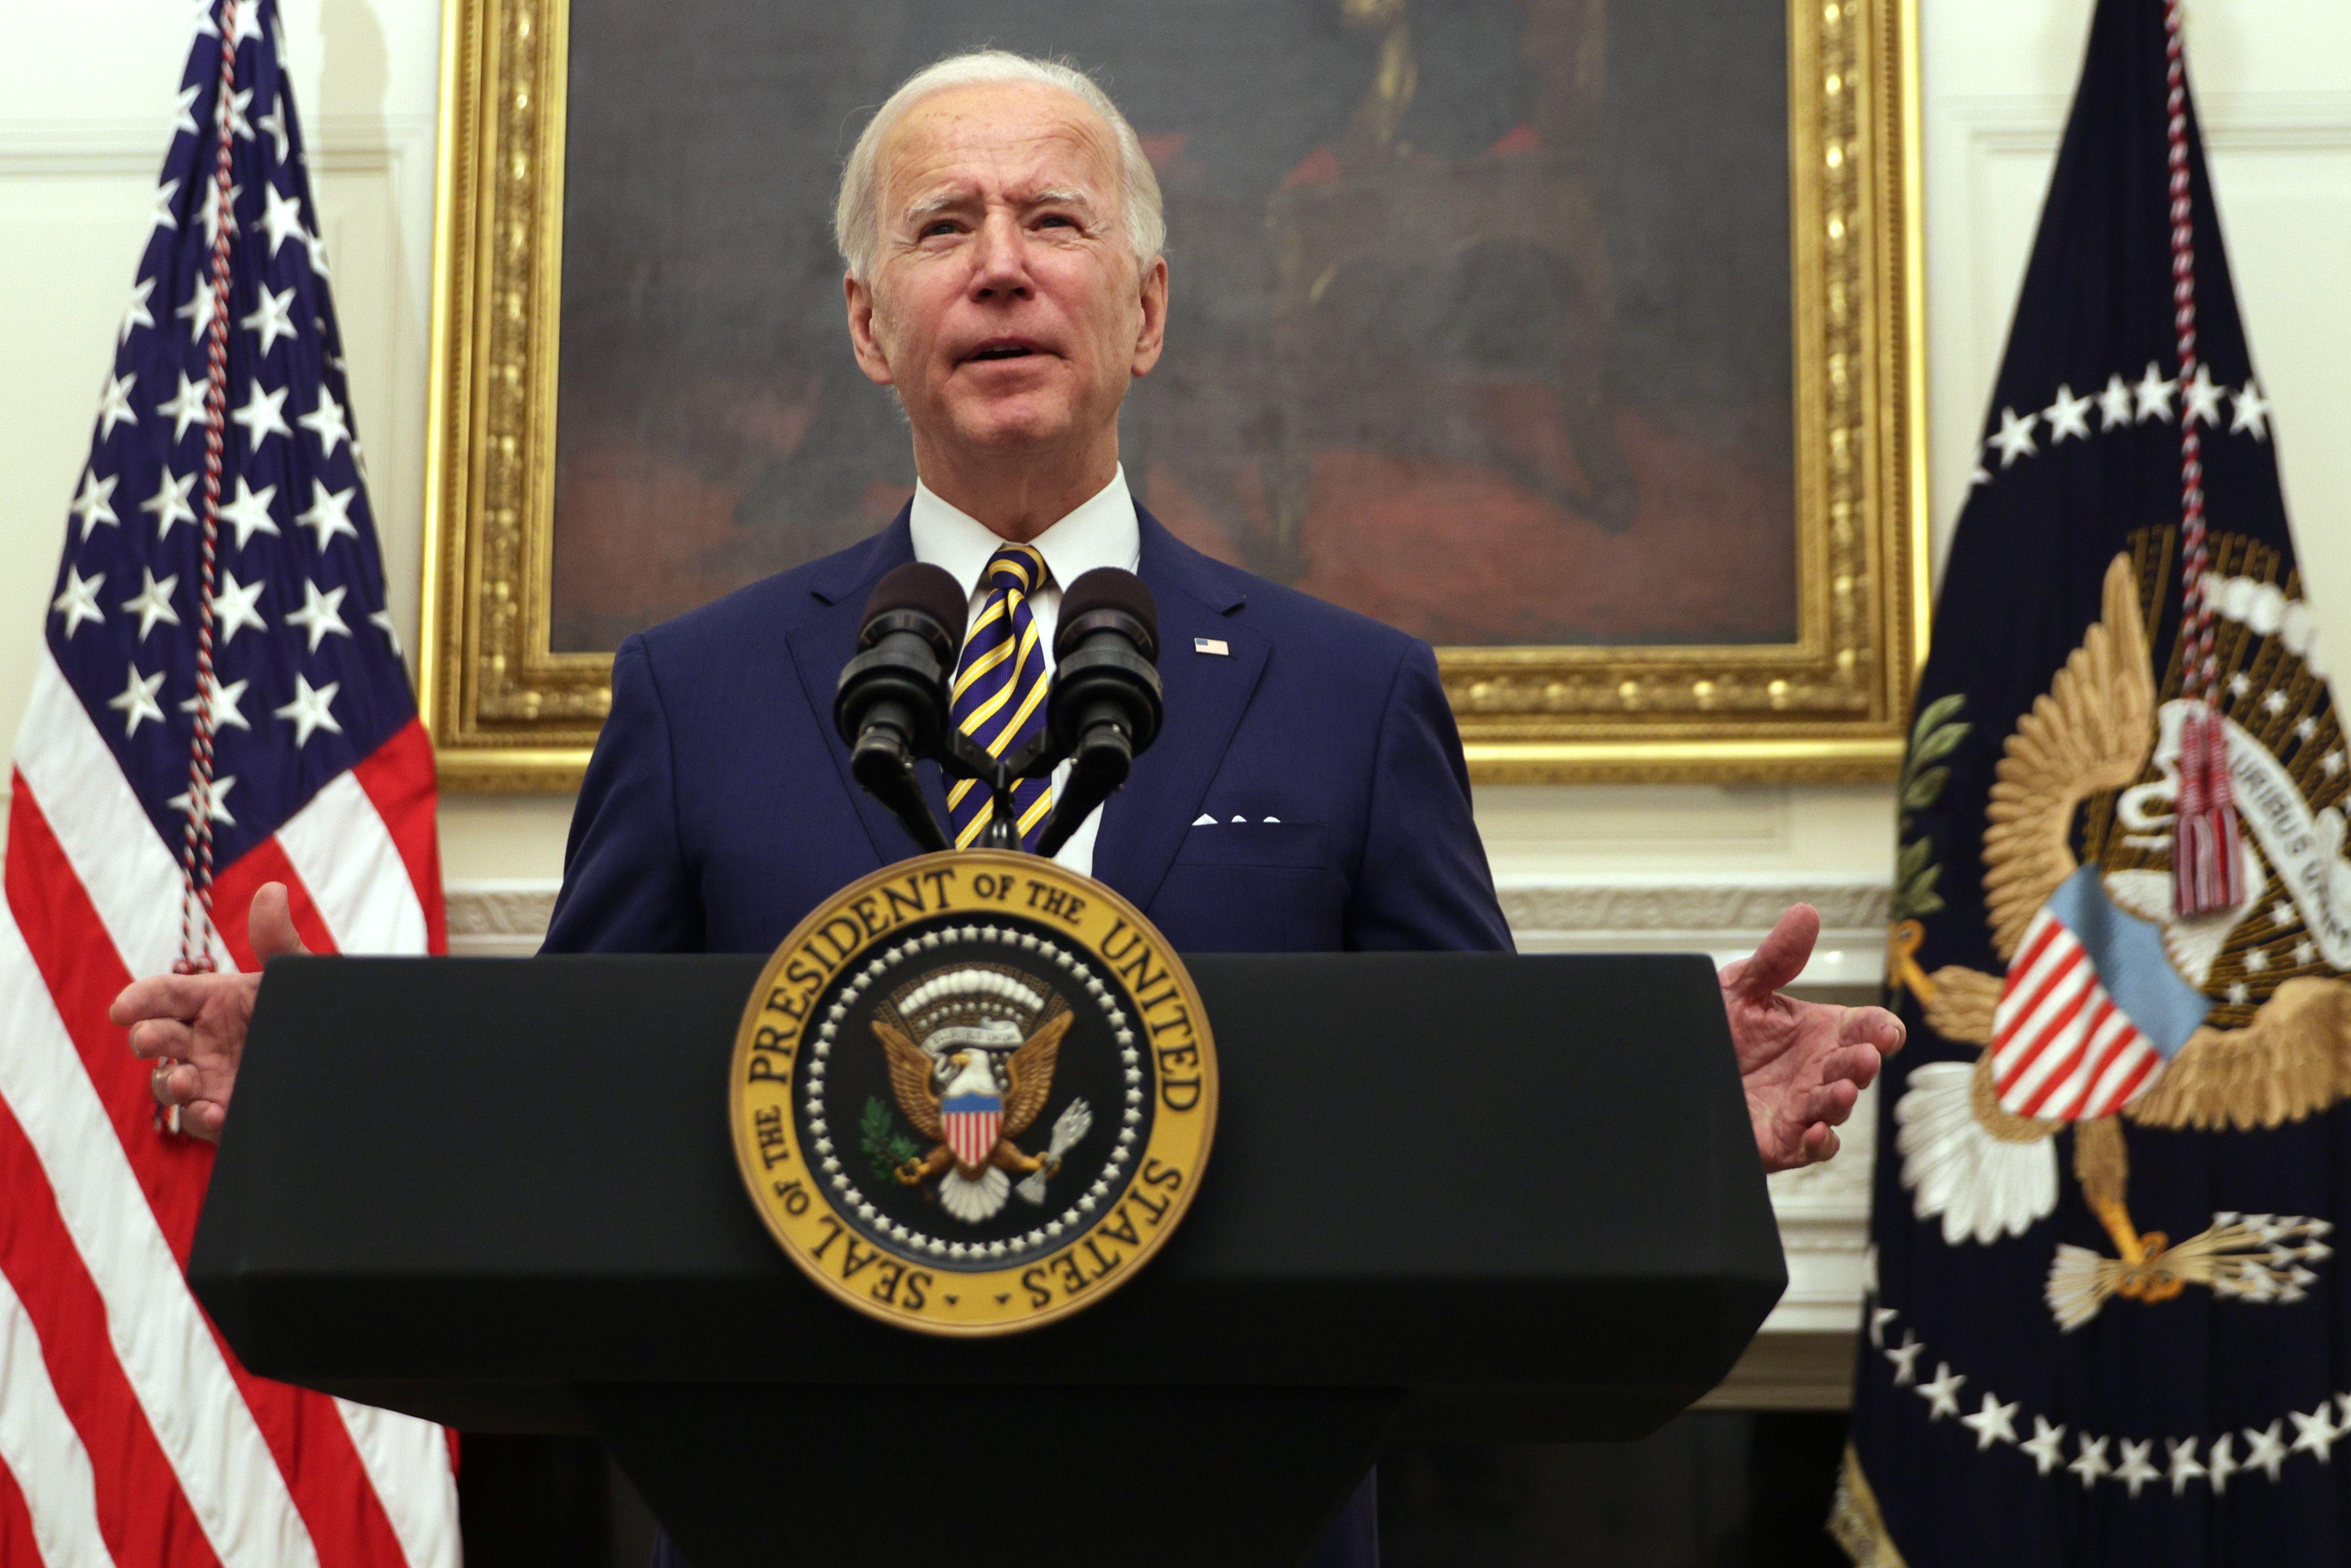 Joe Biden speaks from a presidential podium.